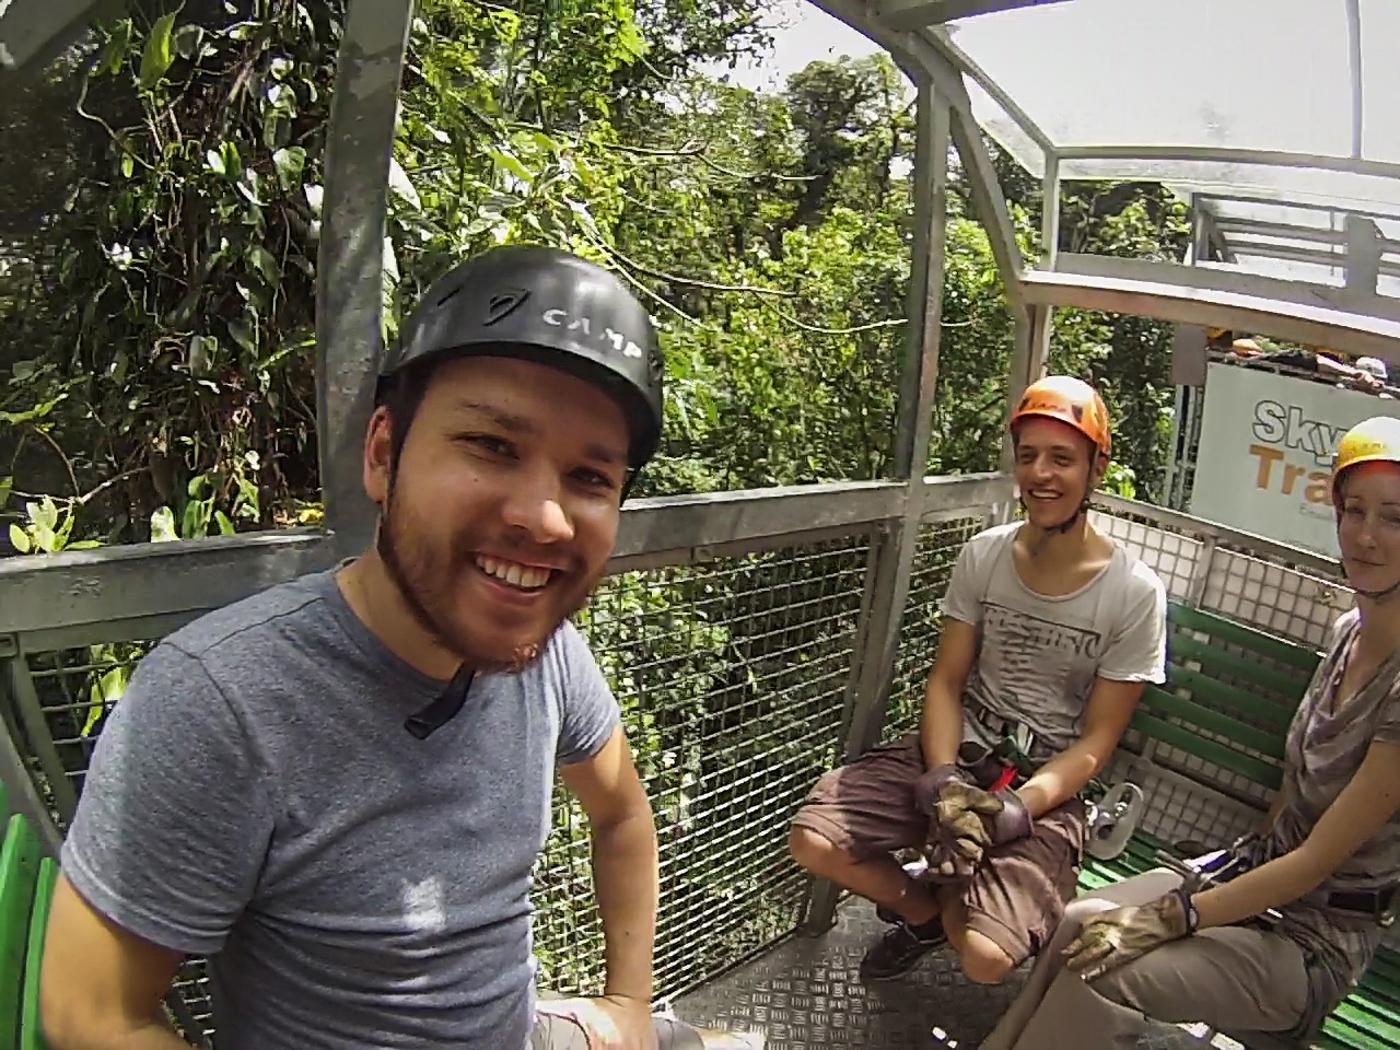 Sky Tram gondola ride Sky Adventures Arenal, Costa Rica